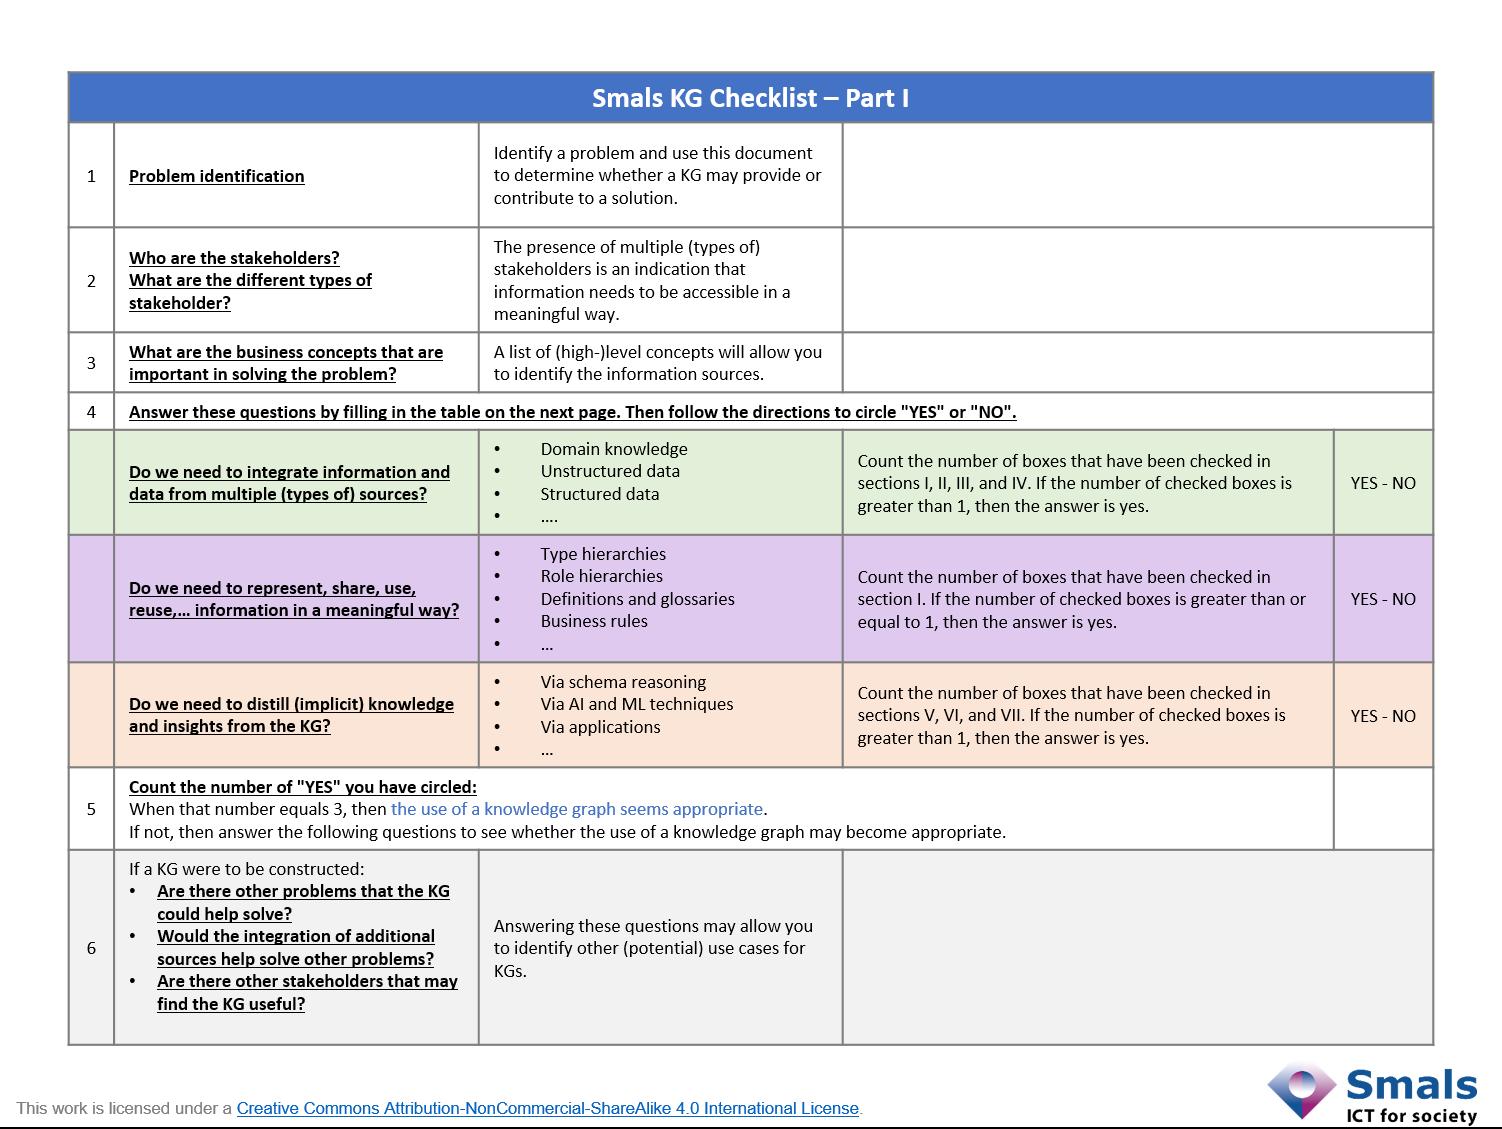 Part I of the Smals KG Checklist.